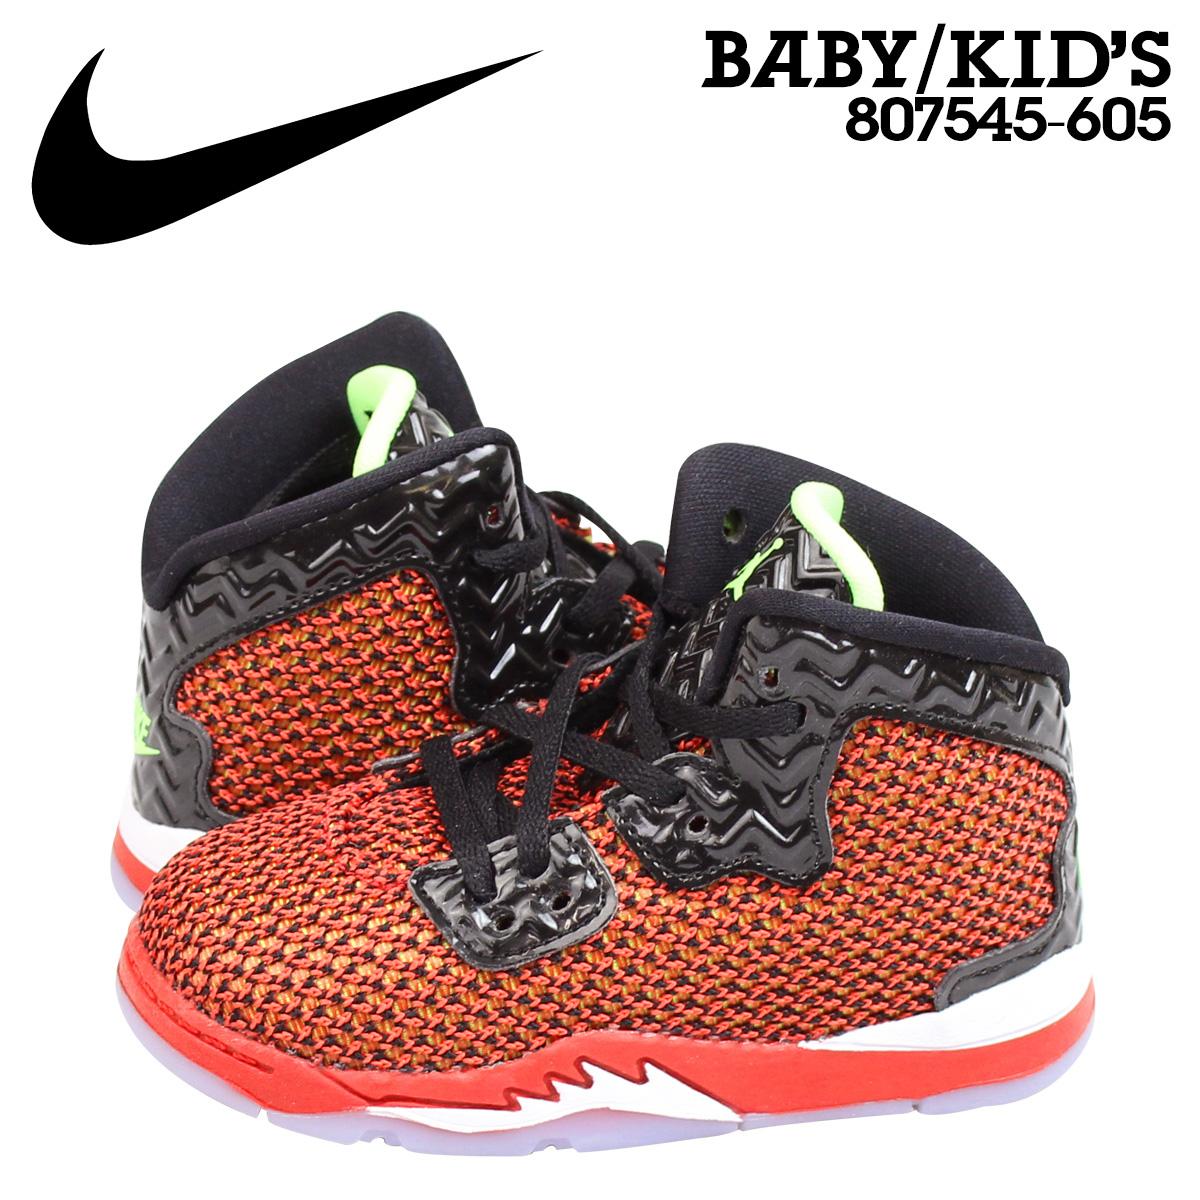 b49a45109136c9 Whats up Sports  NIKE Nike Air Jordan sneakers baby kids AIR JORDAN SPIKE  FORTY TD Air Jordan spike 40 807545-605 red shoes